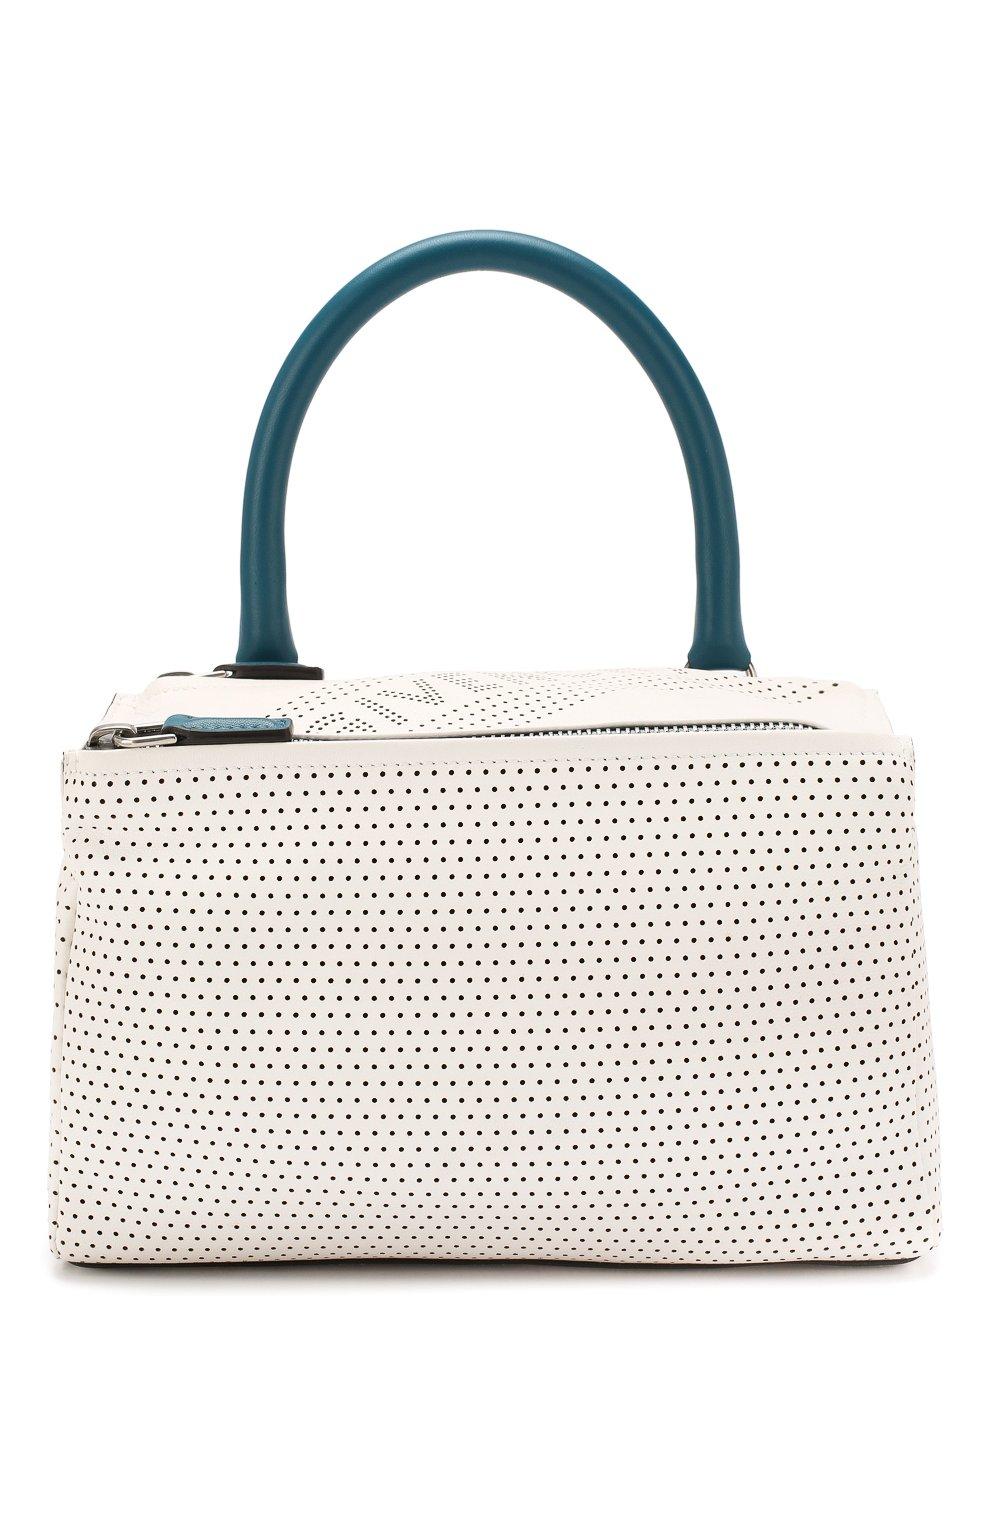 Кожаная сумка Pandora small | Фото №1